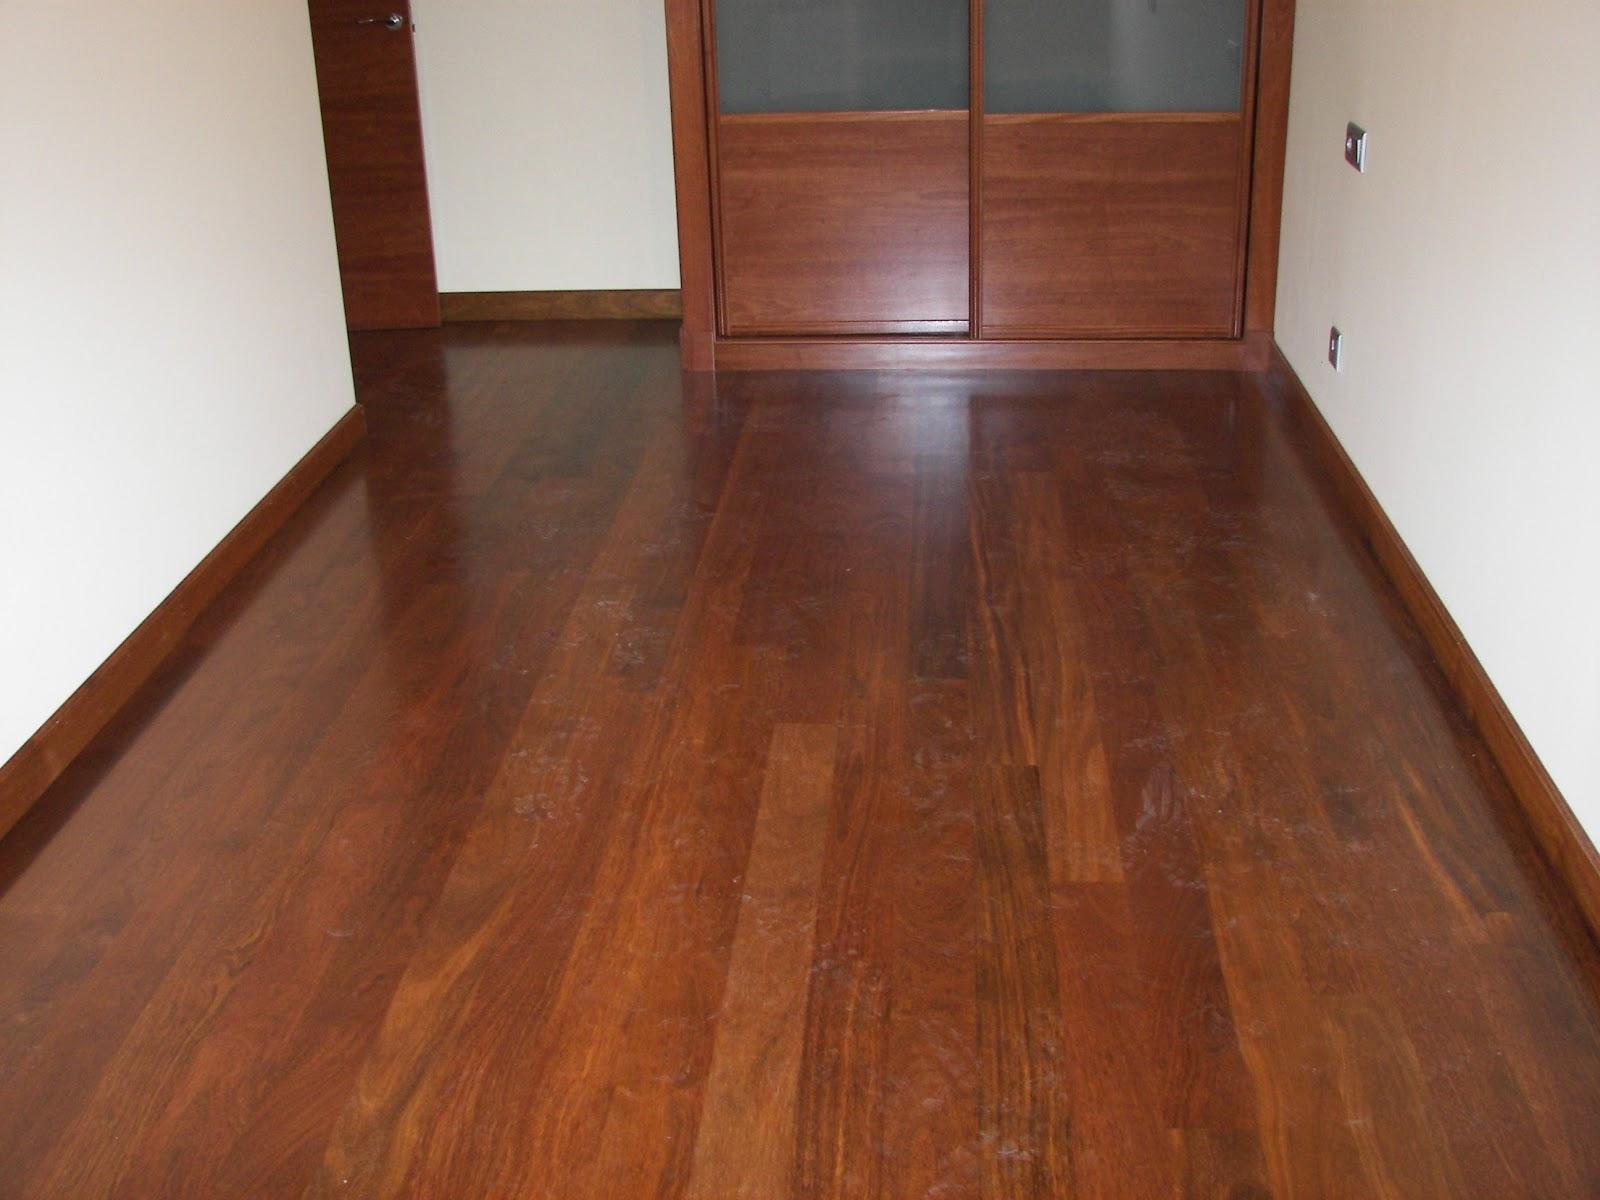 Trucos para mantener tu parquet de madera - Tipos de madera para suelos ...